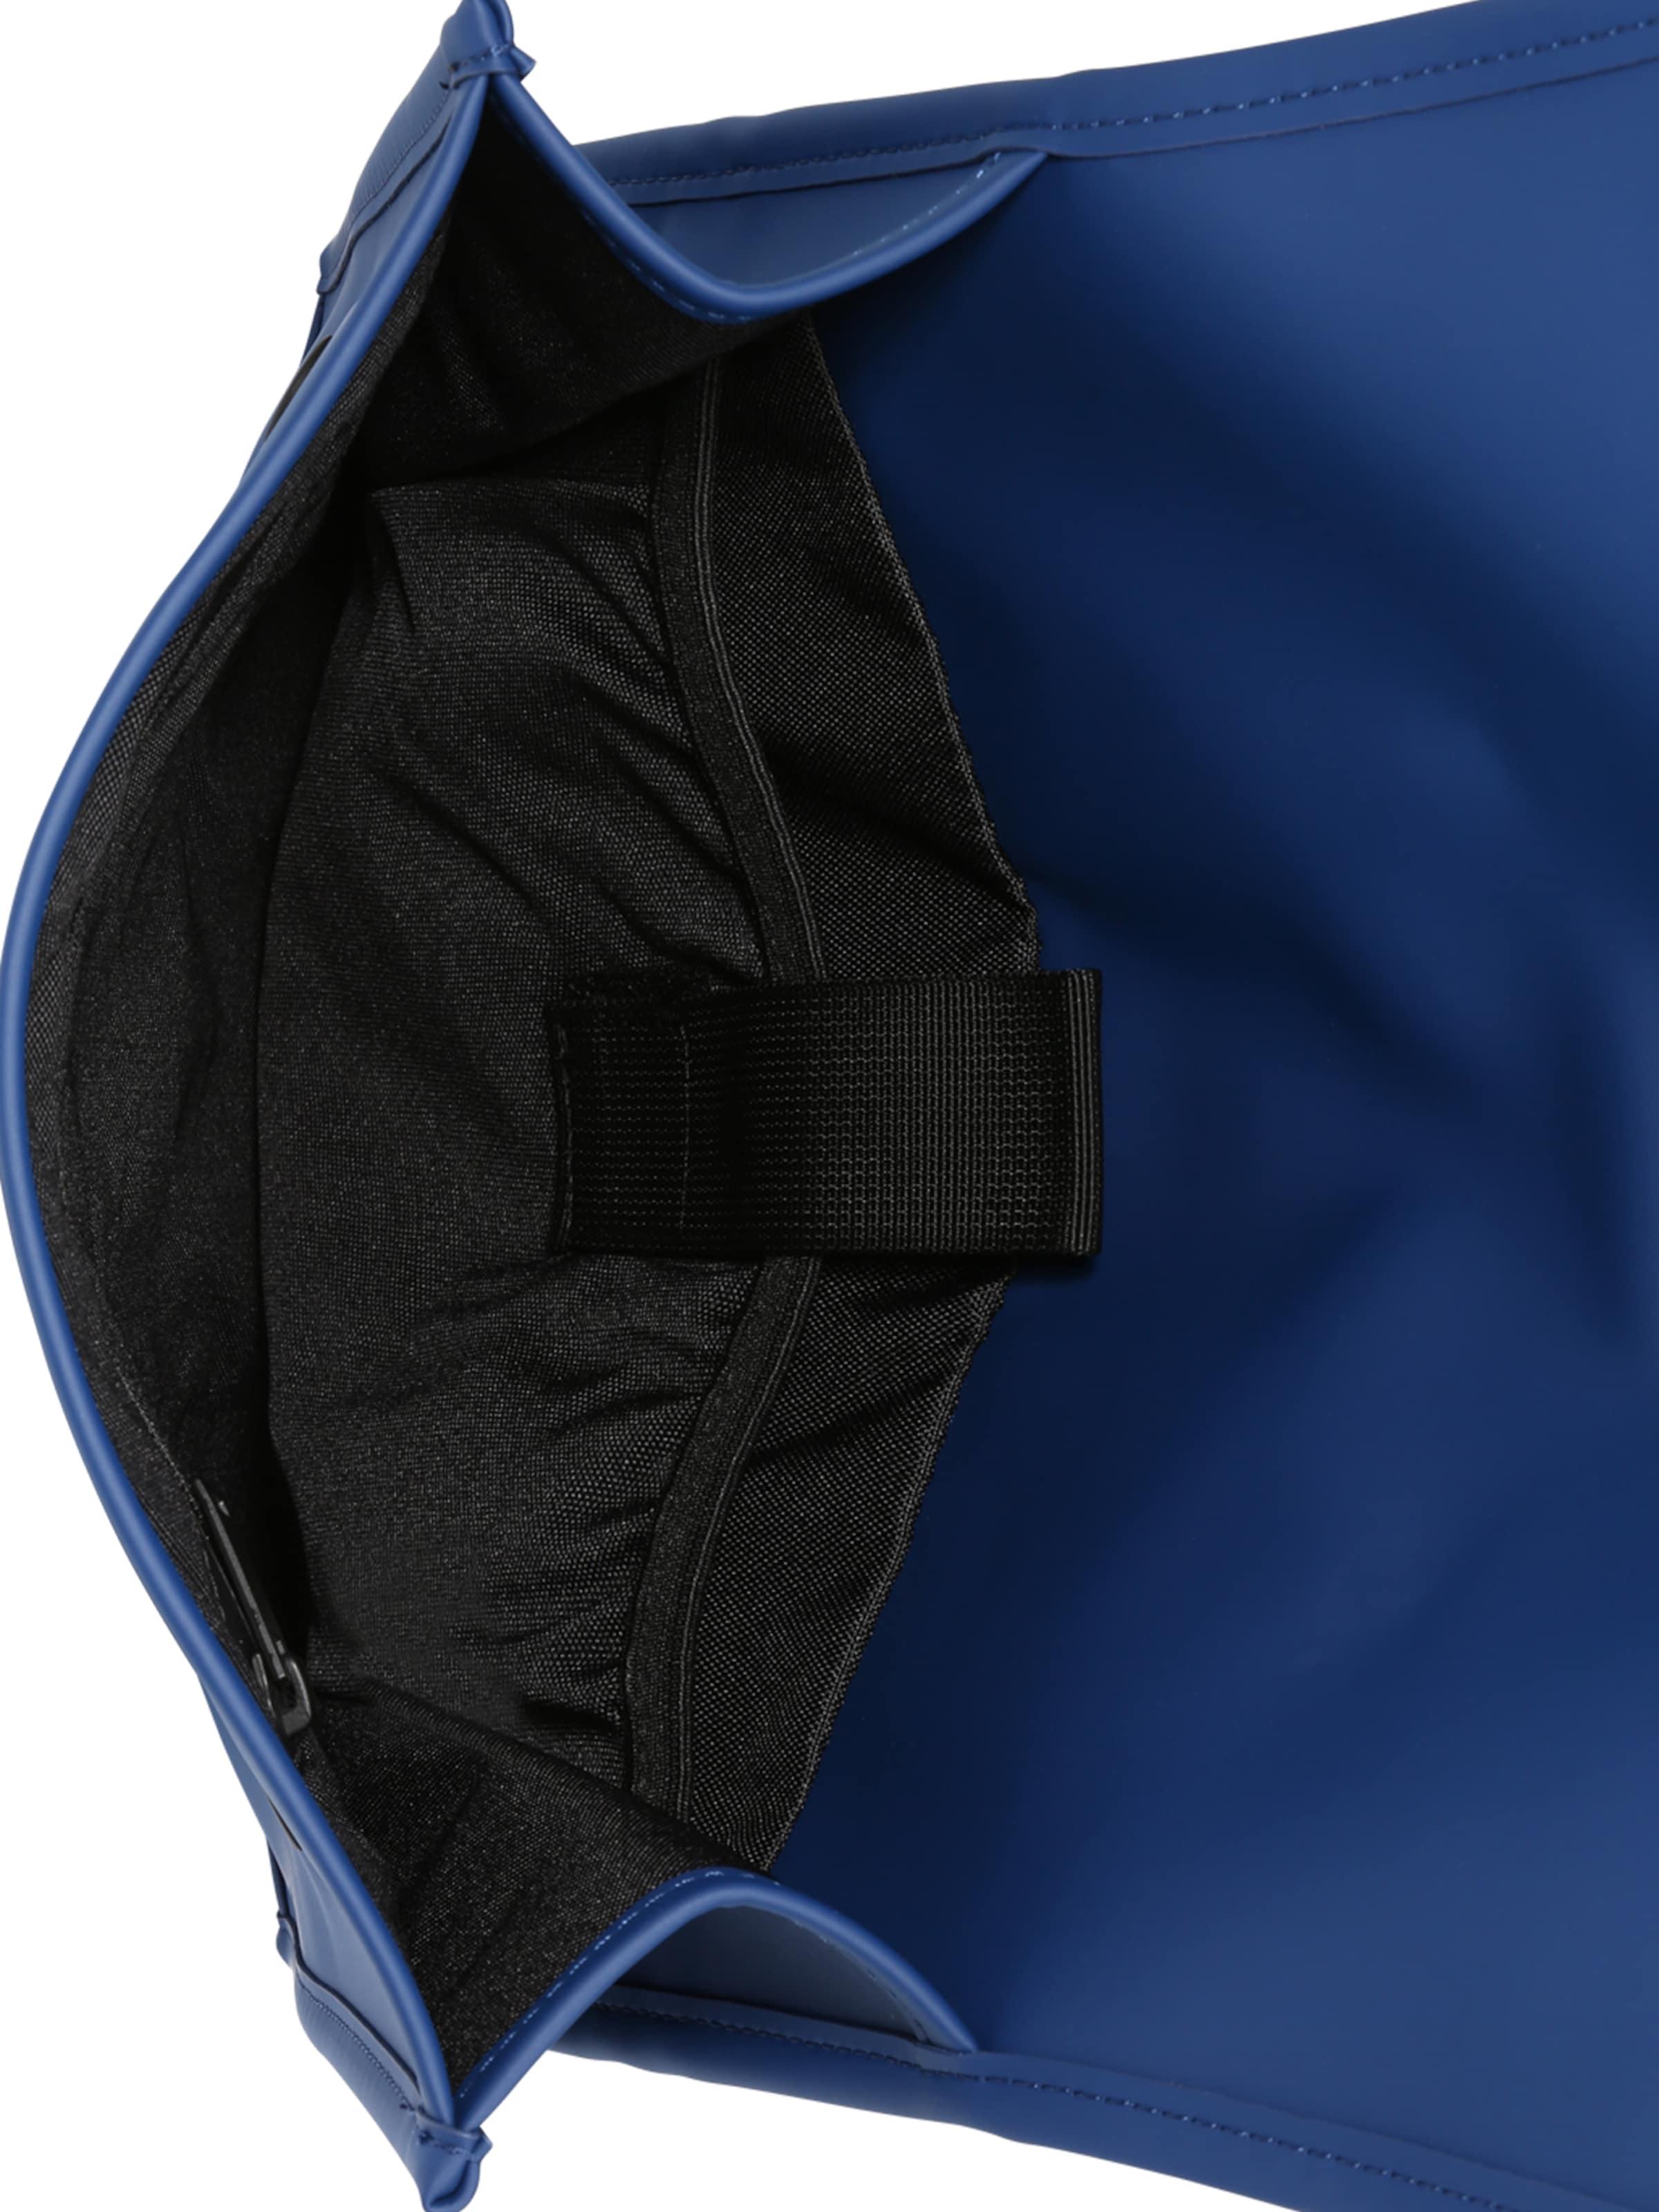 À Mini' En Bleu Rains Sac Dos 'backpack QrBtsdxohC